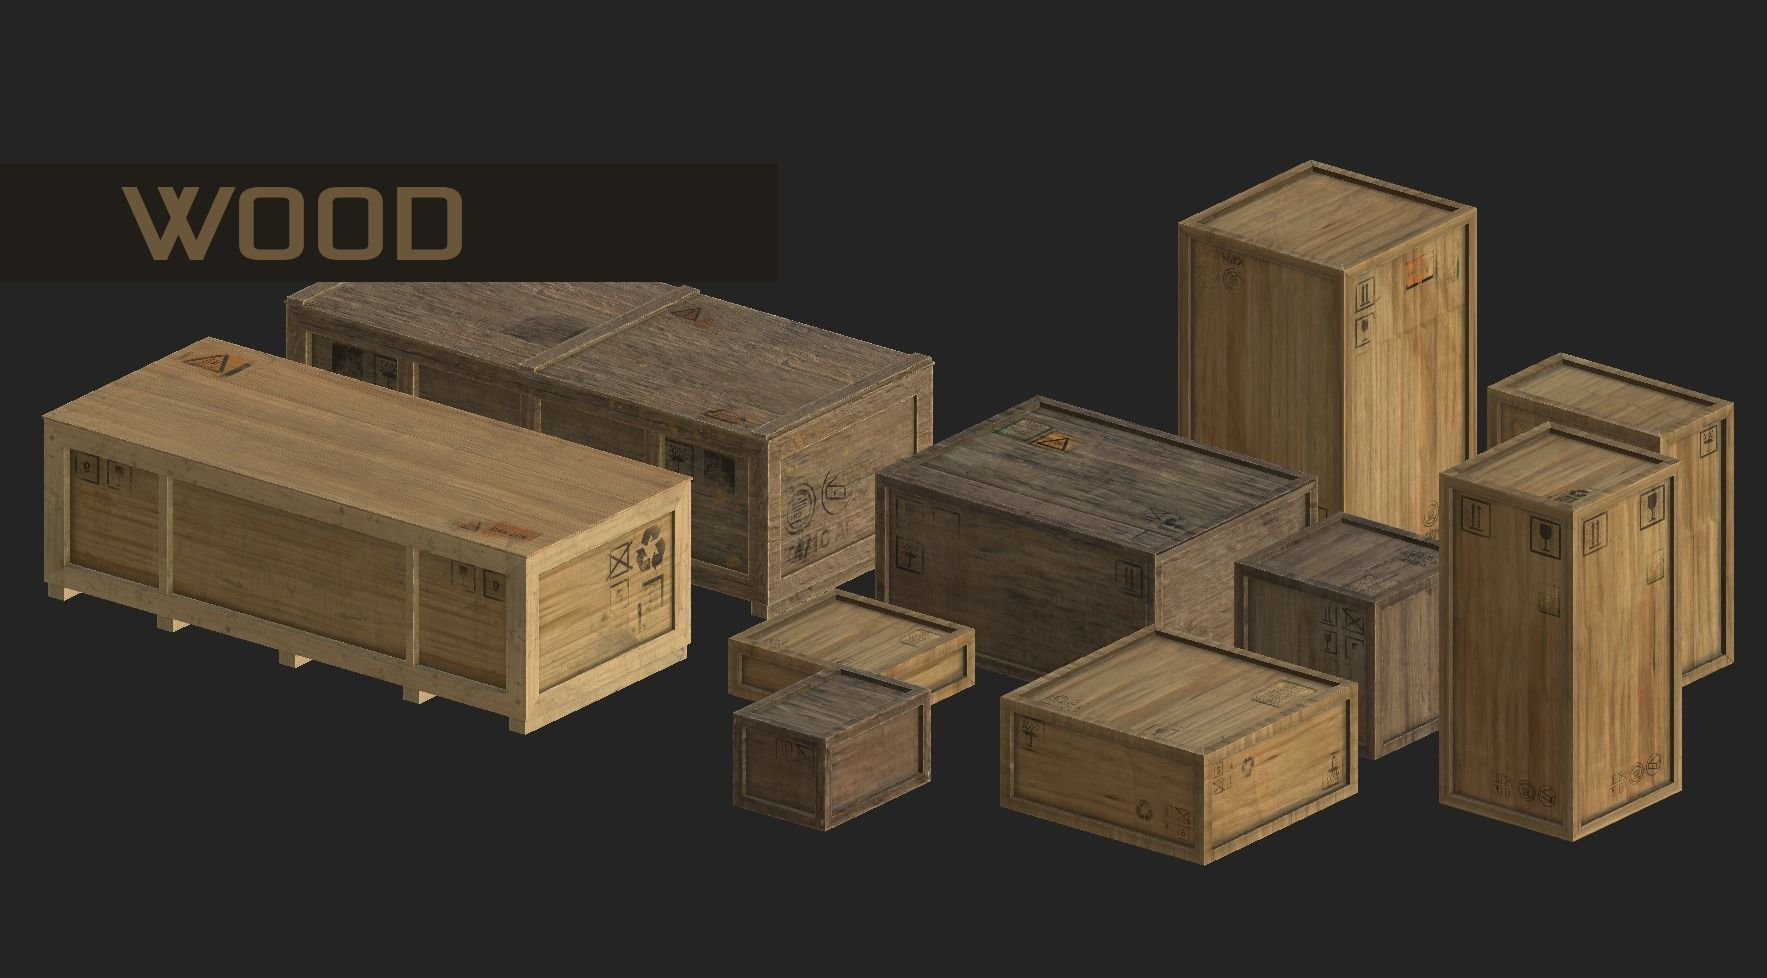 apocalyptic interior cargo transport crates pack